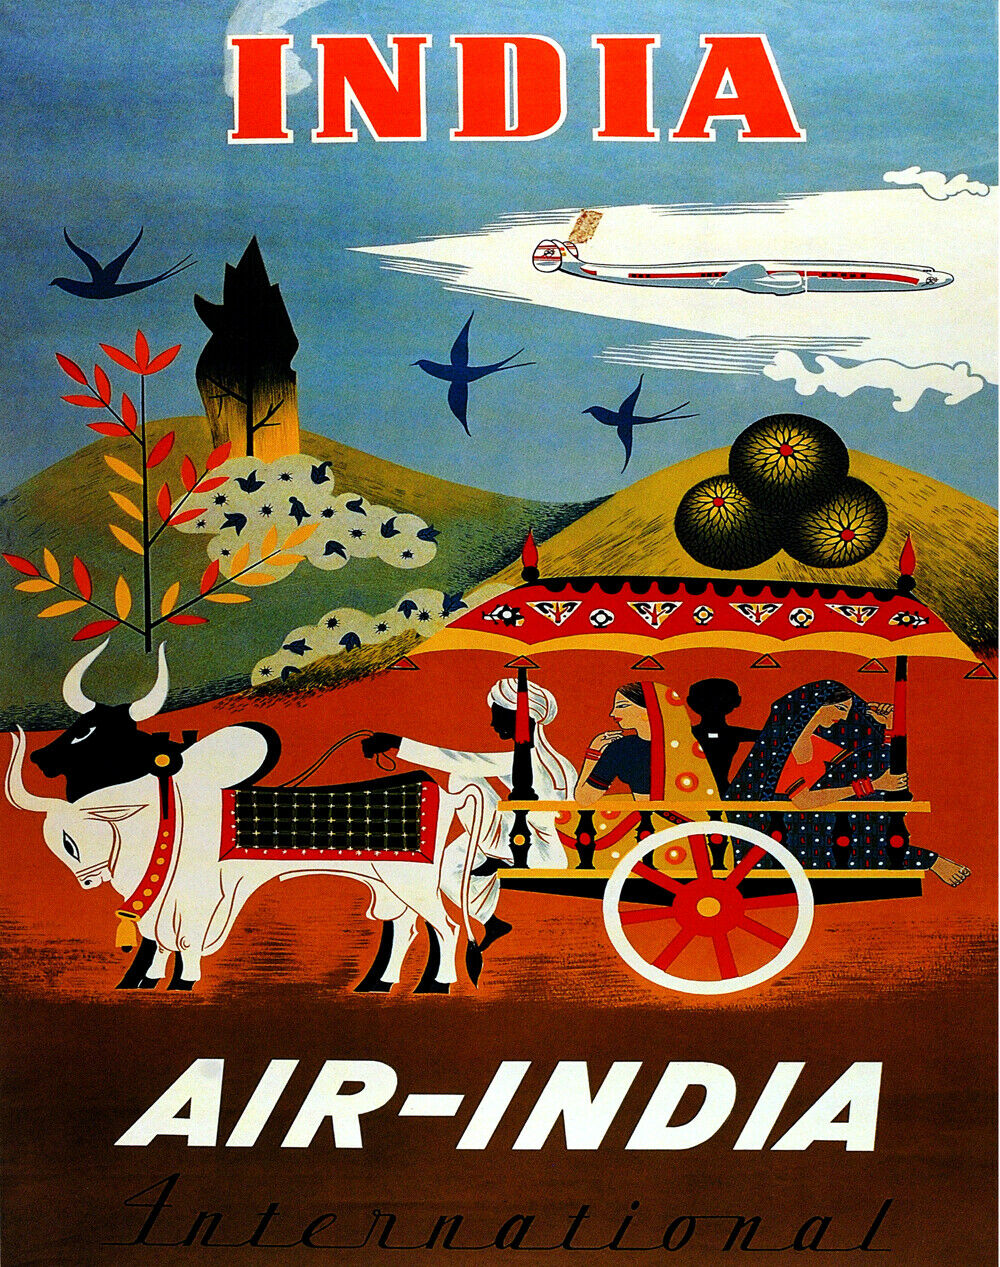 8292.Decoration Poster.Home Room design art print.India tourism.Travel decor